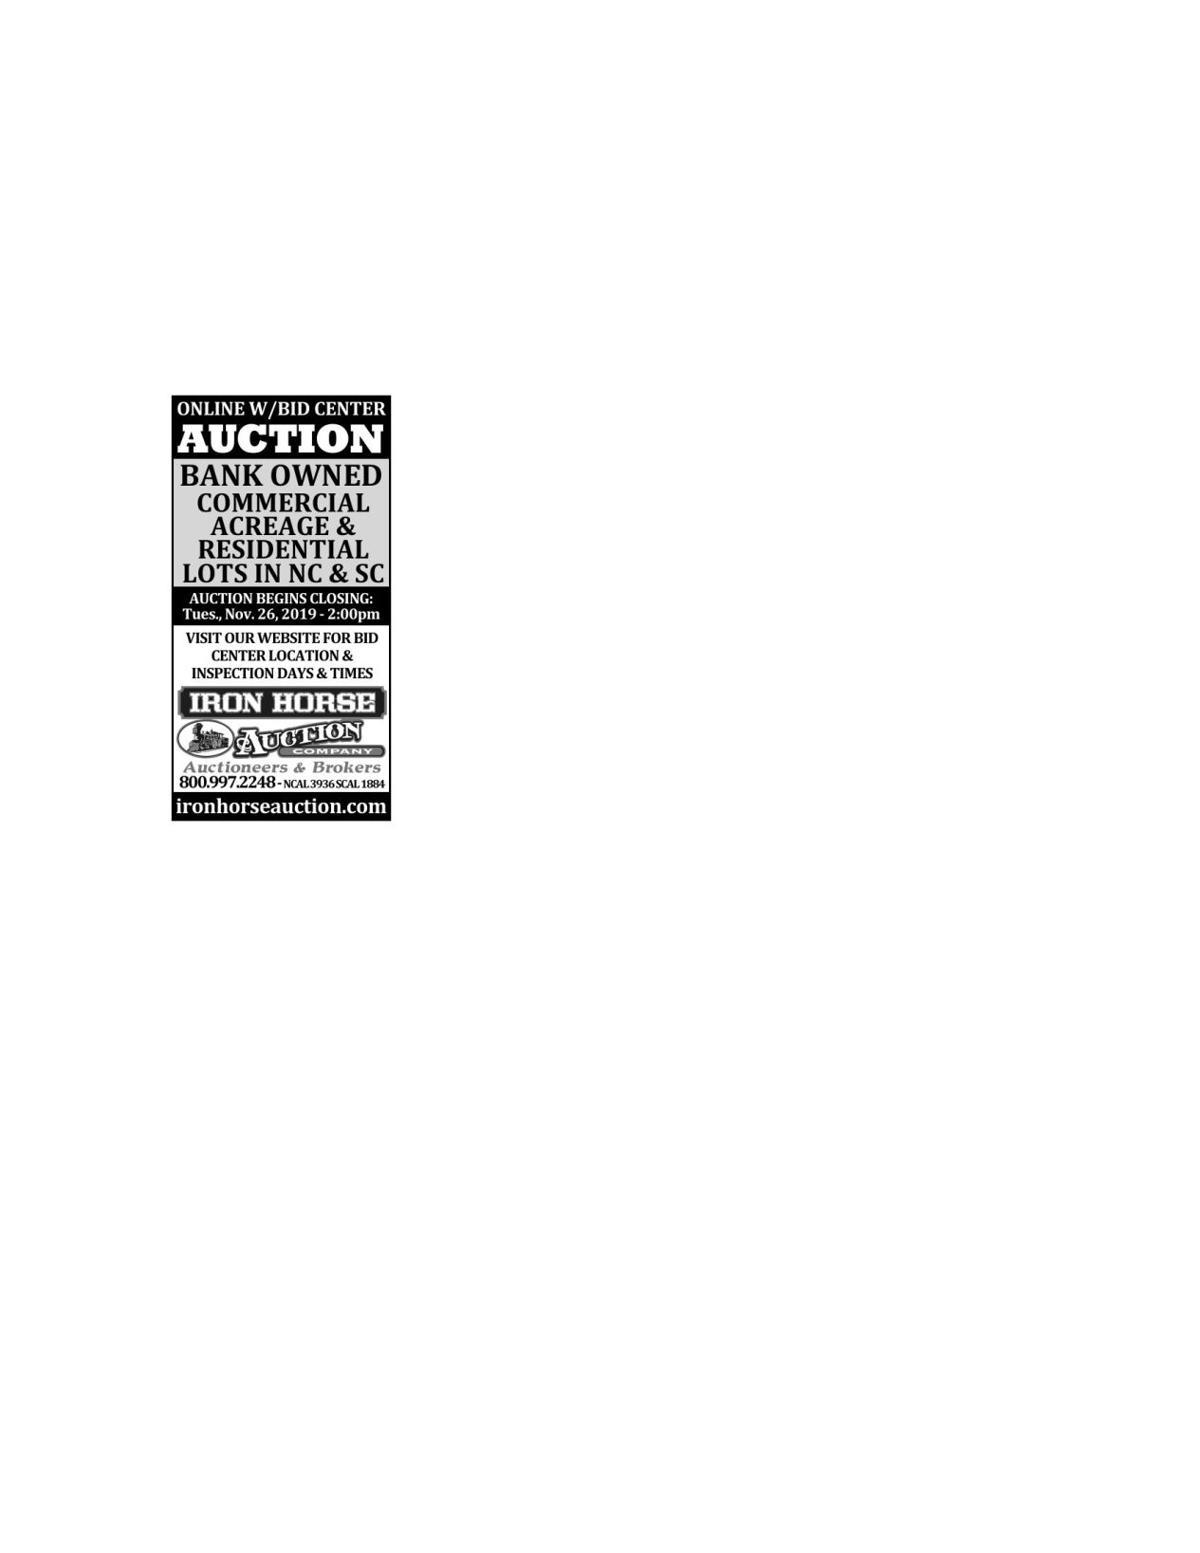 Iron Horse Auction